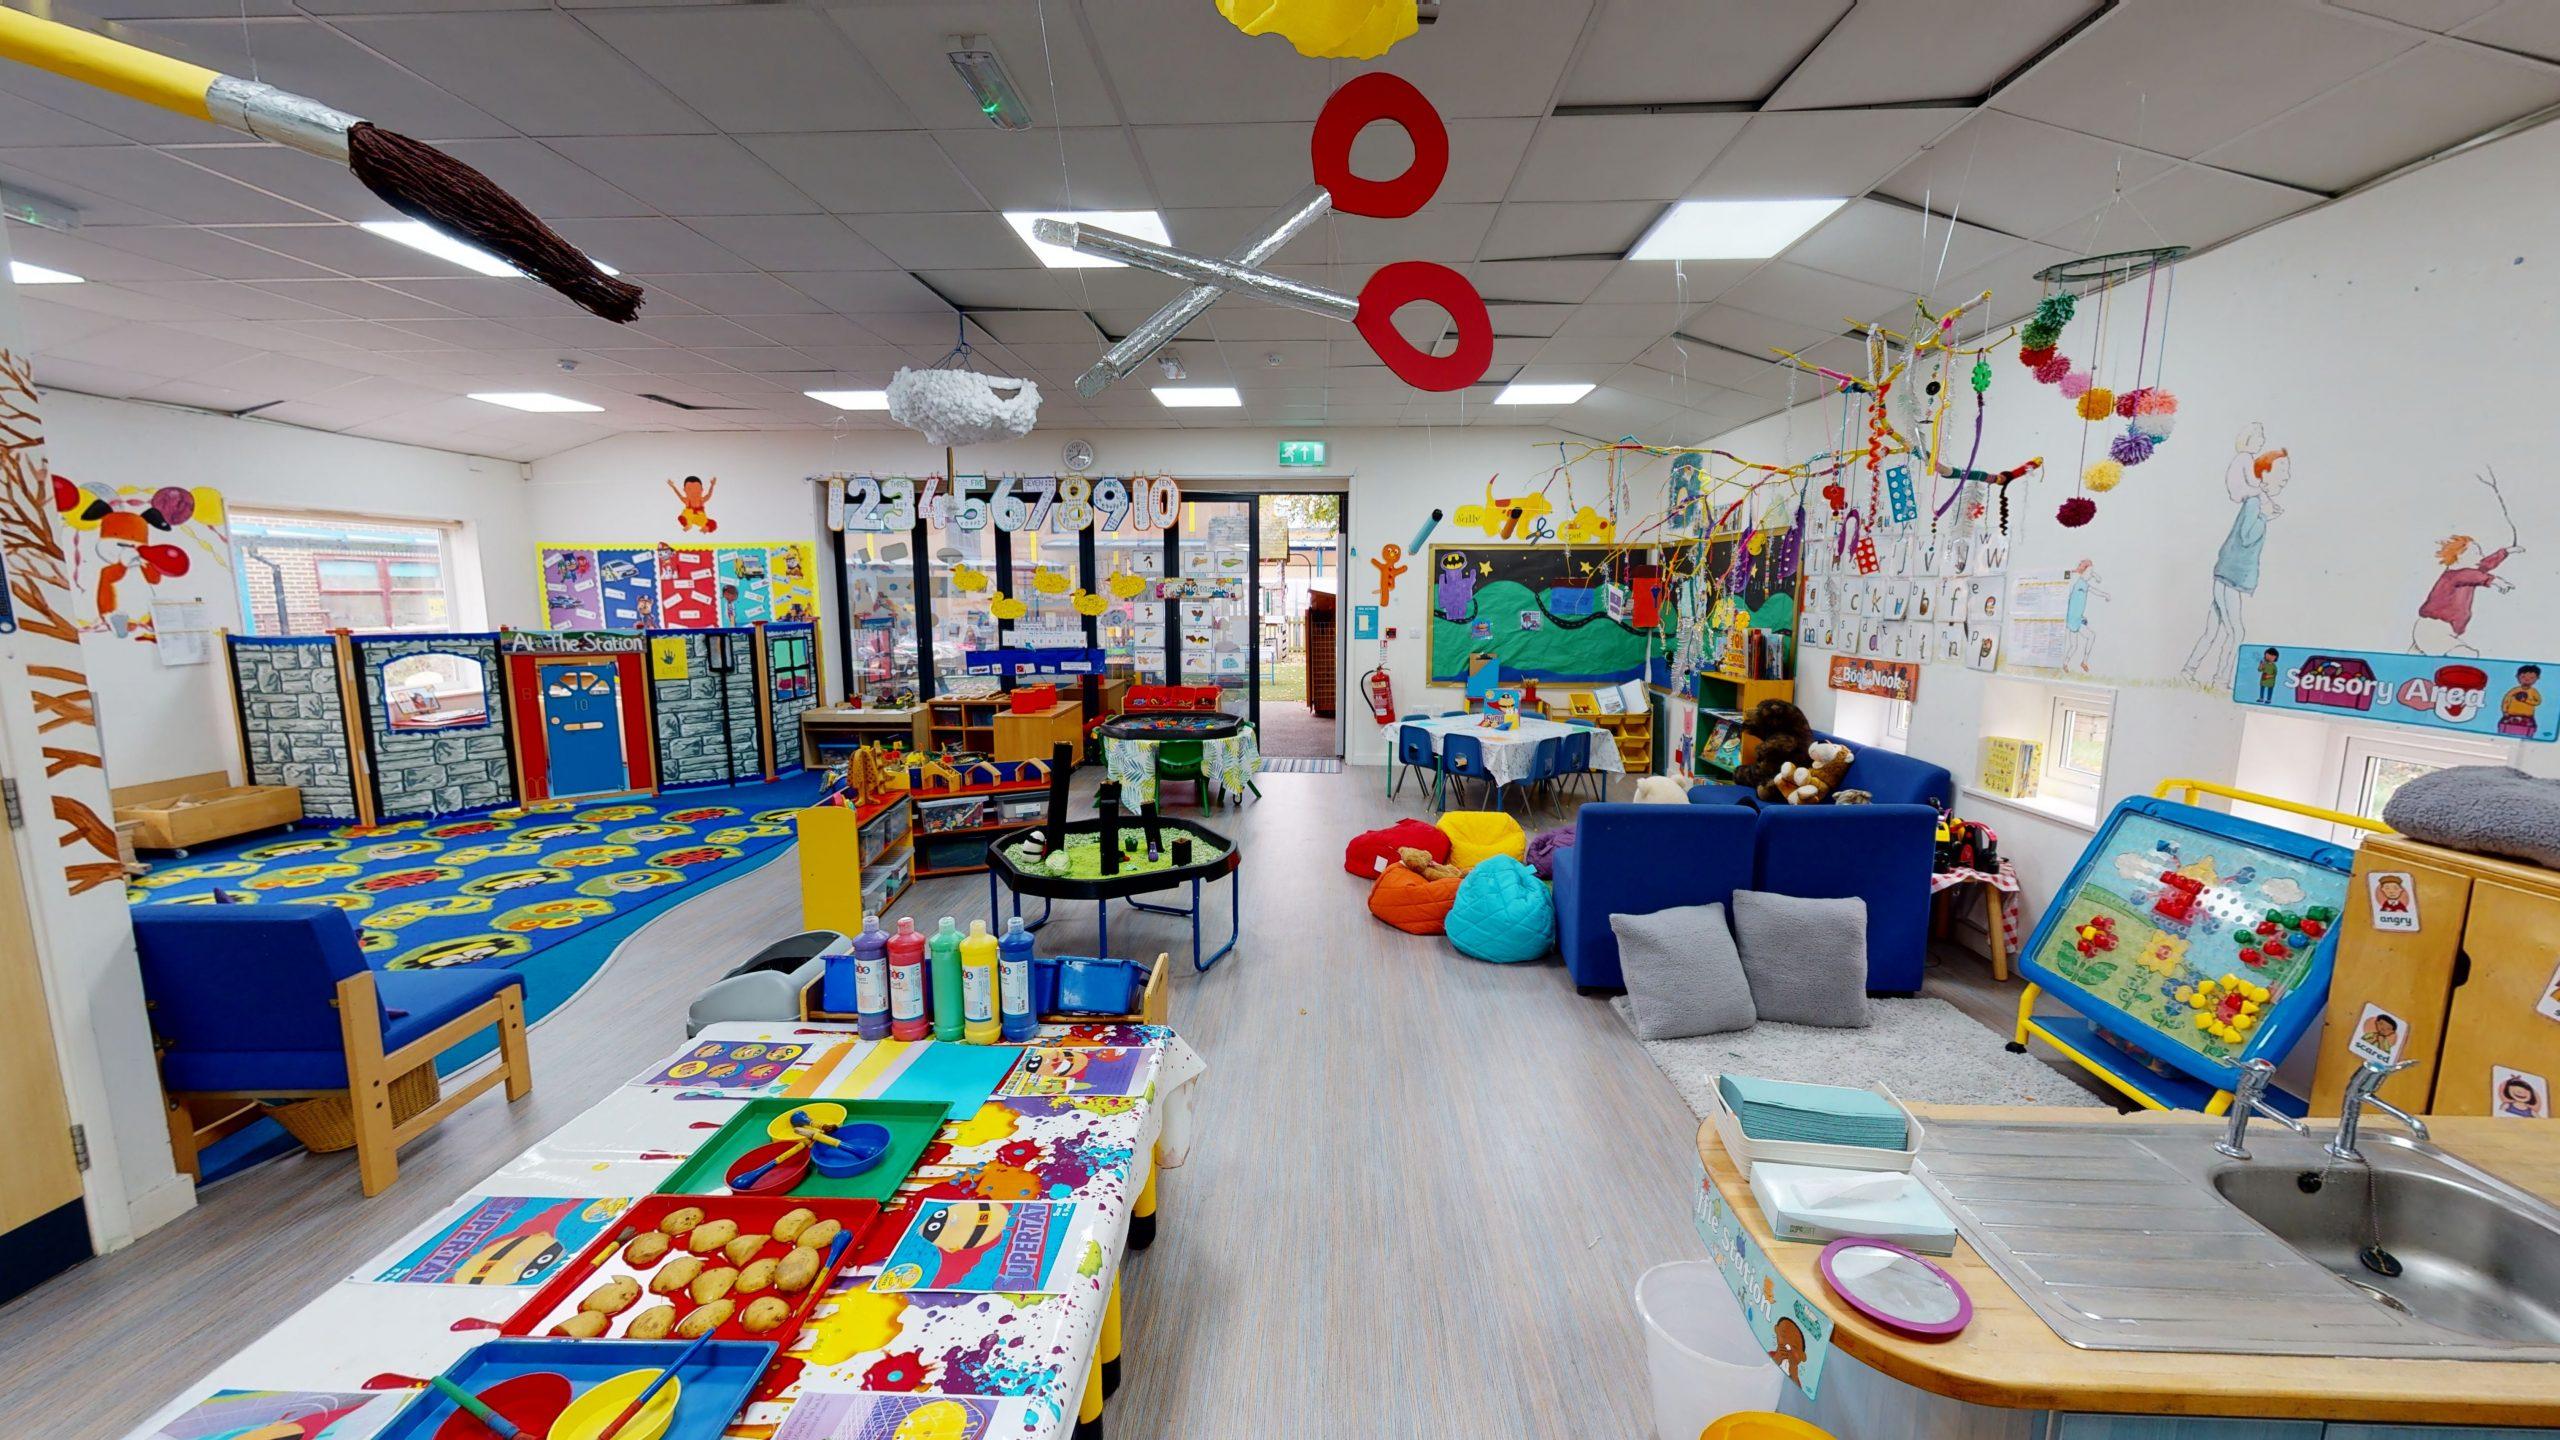 regis manor primary school